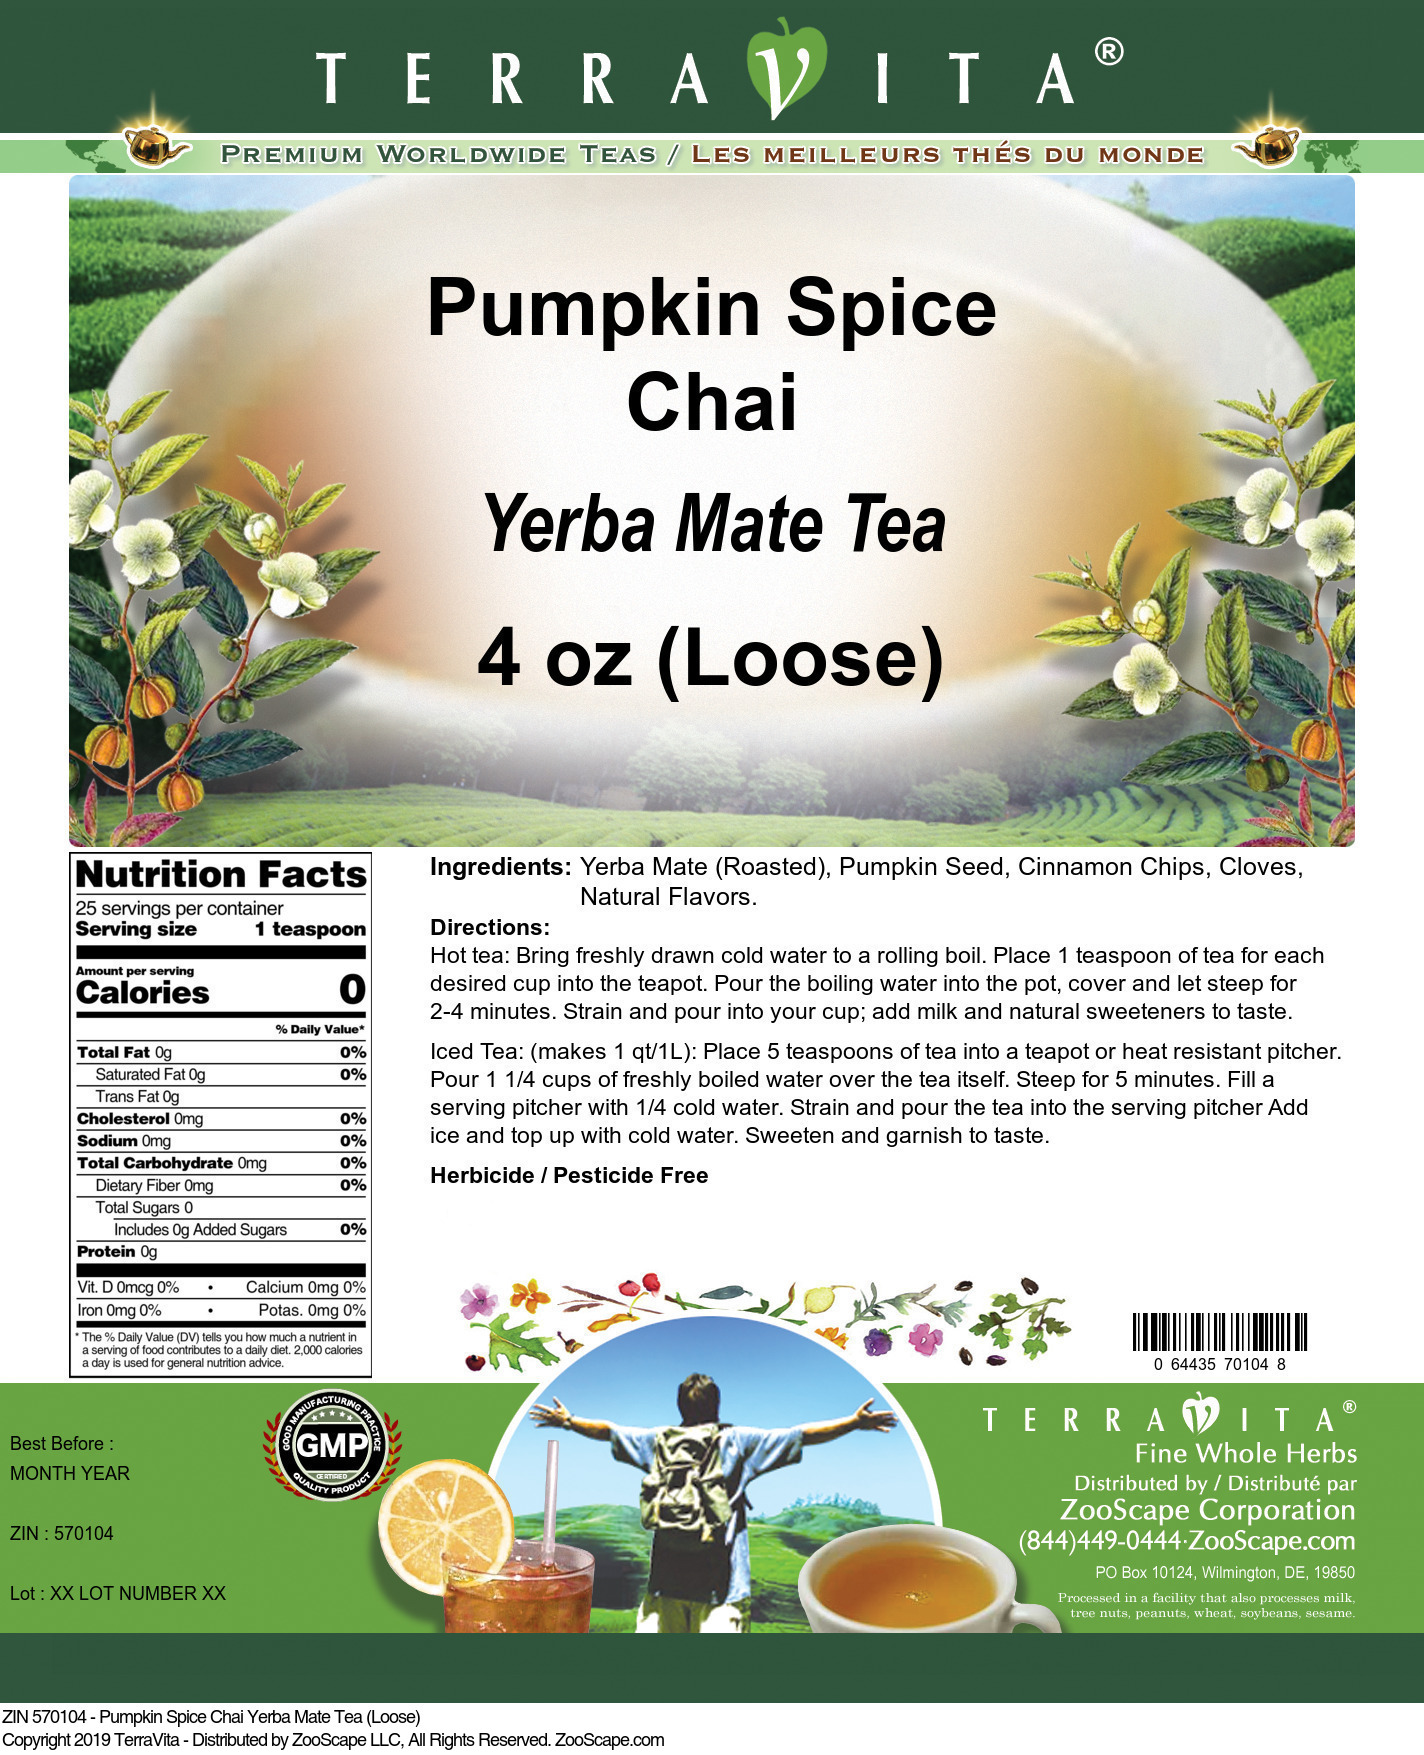 Pumpkin Spice Chai Yerba Mate Tea (Loose)